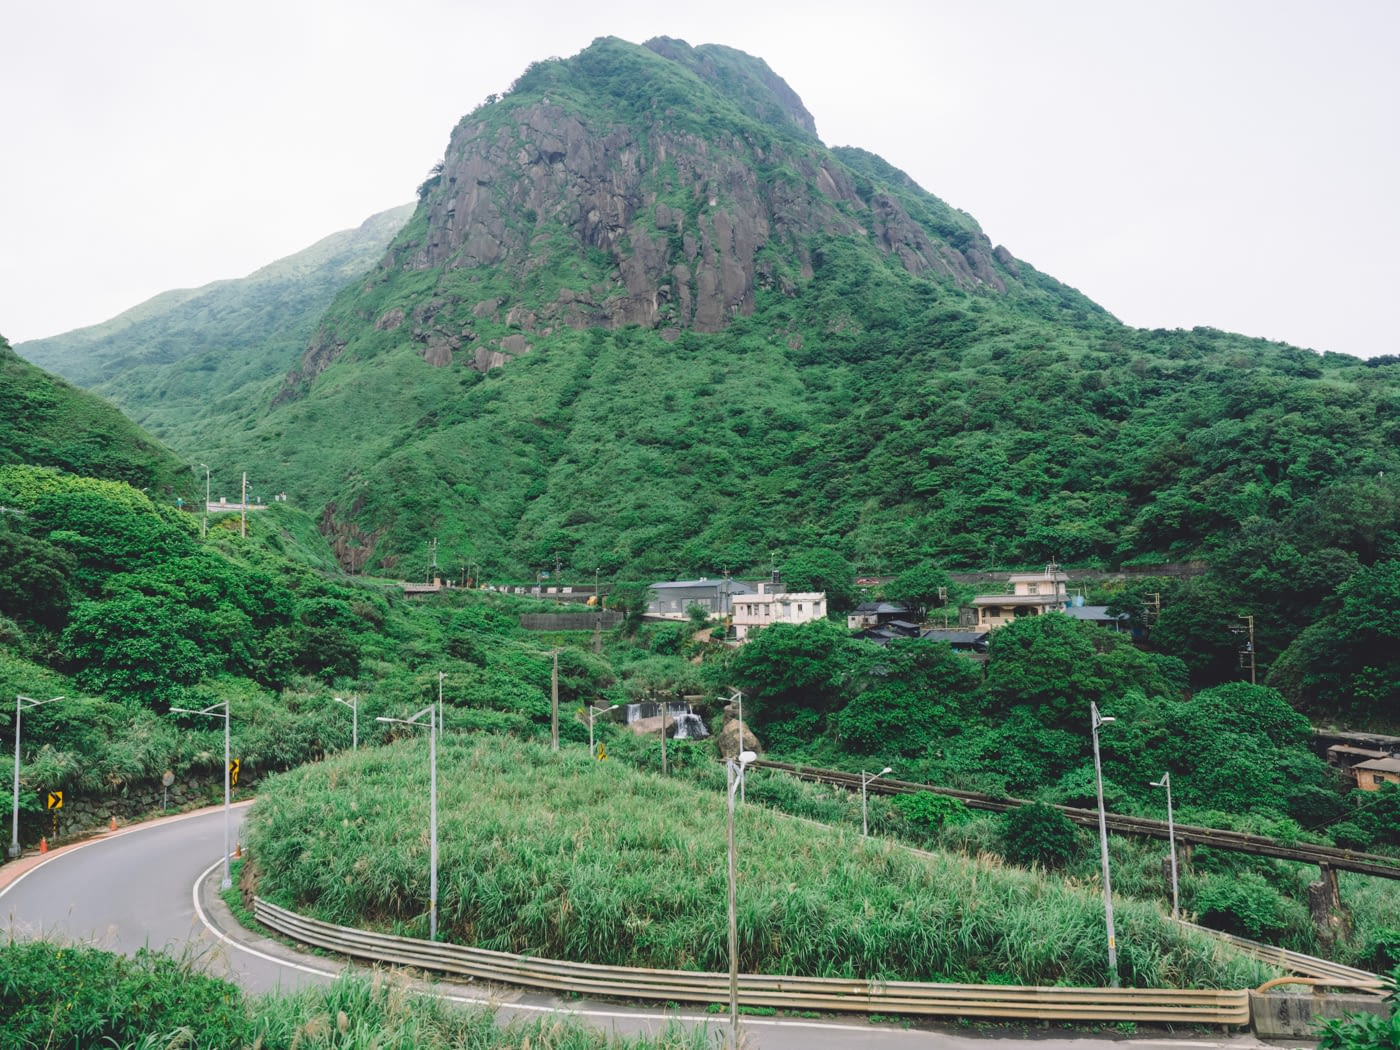 Taiwan - New Taipei City - Mountain road